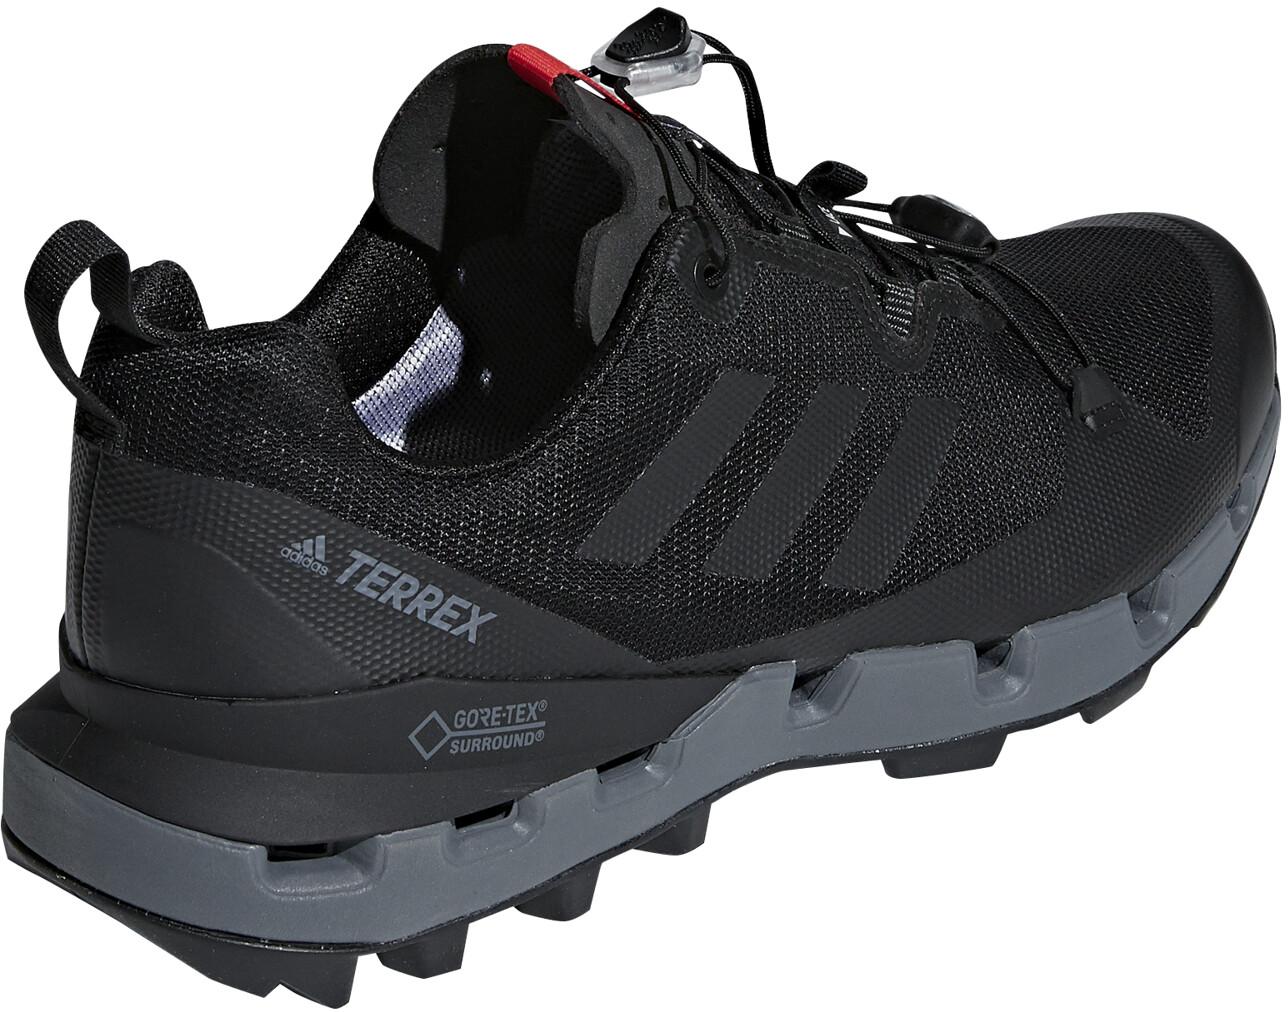 239f8ce4b3 adidas TERREX Fast GTX-Surround Running Shoes Men grey black at ...